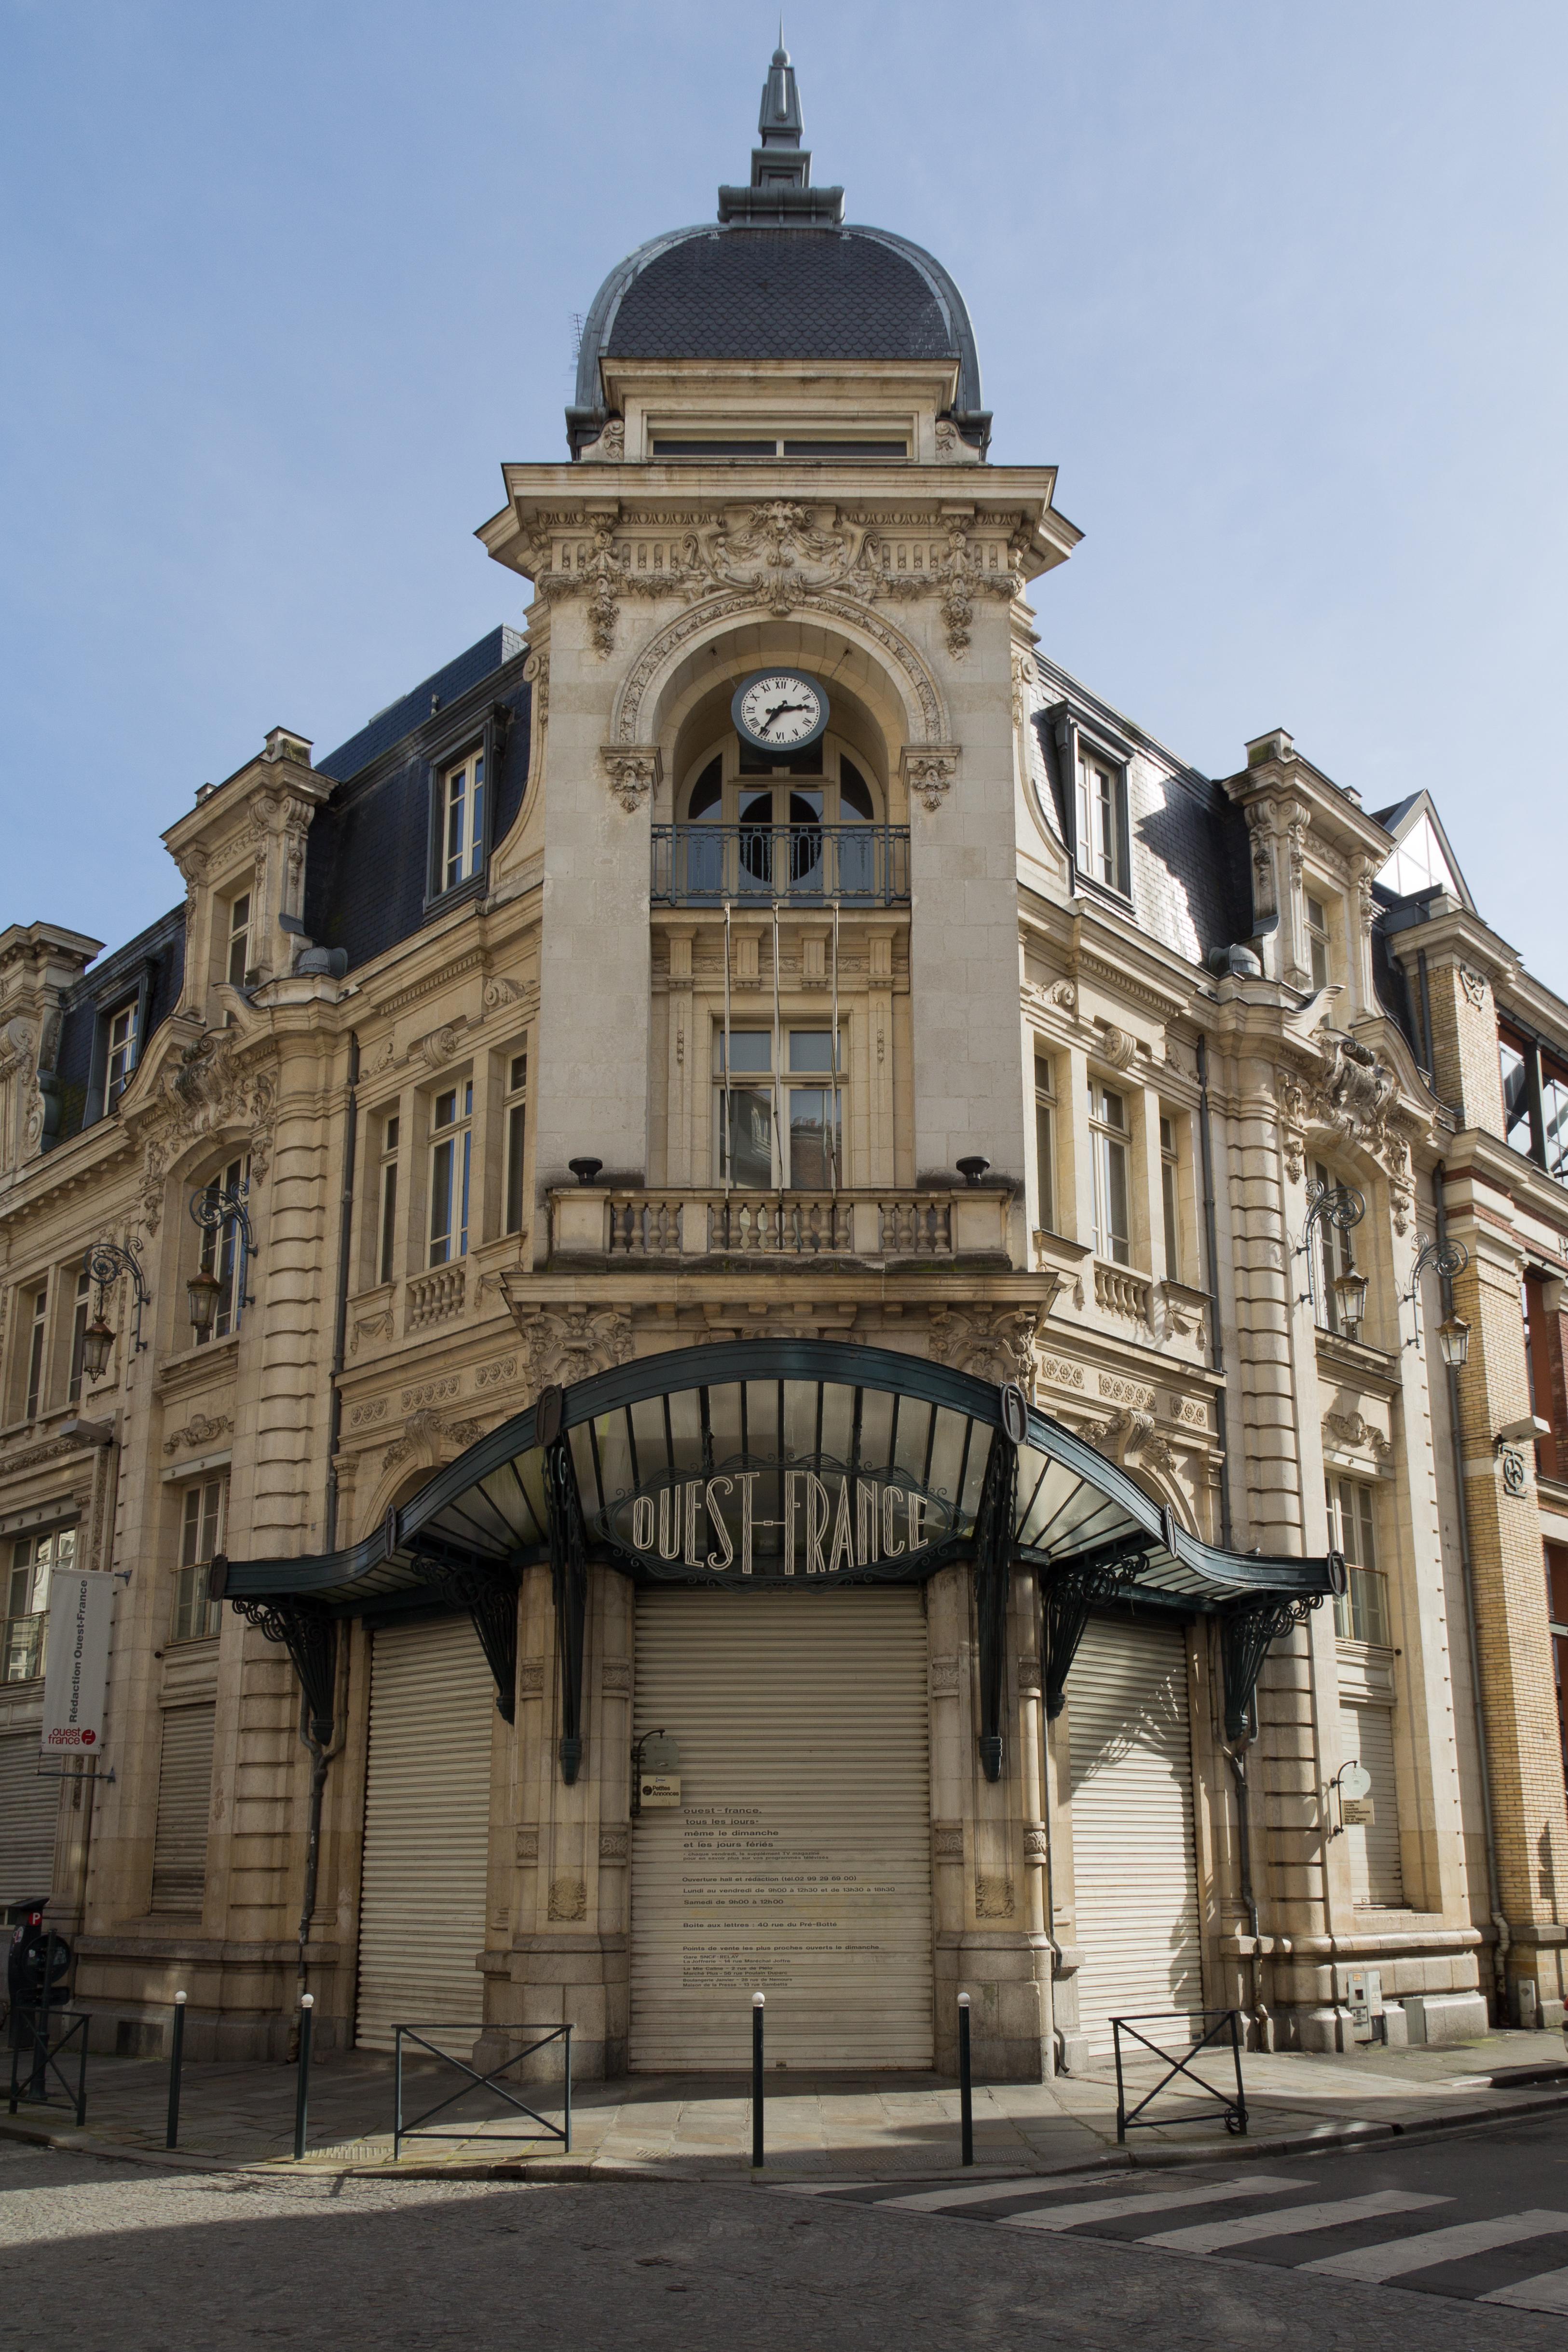 File:Ancien siège du journal Ouest-France à Rennes.jpg - Wikimedia Commons